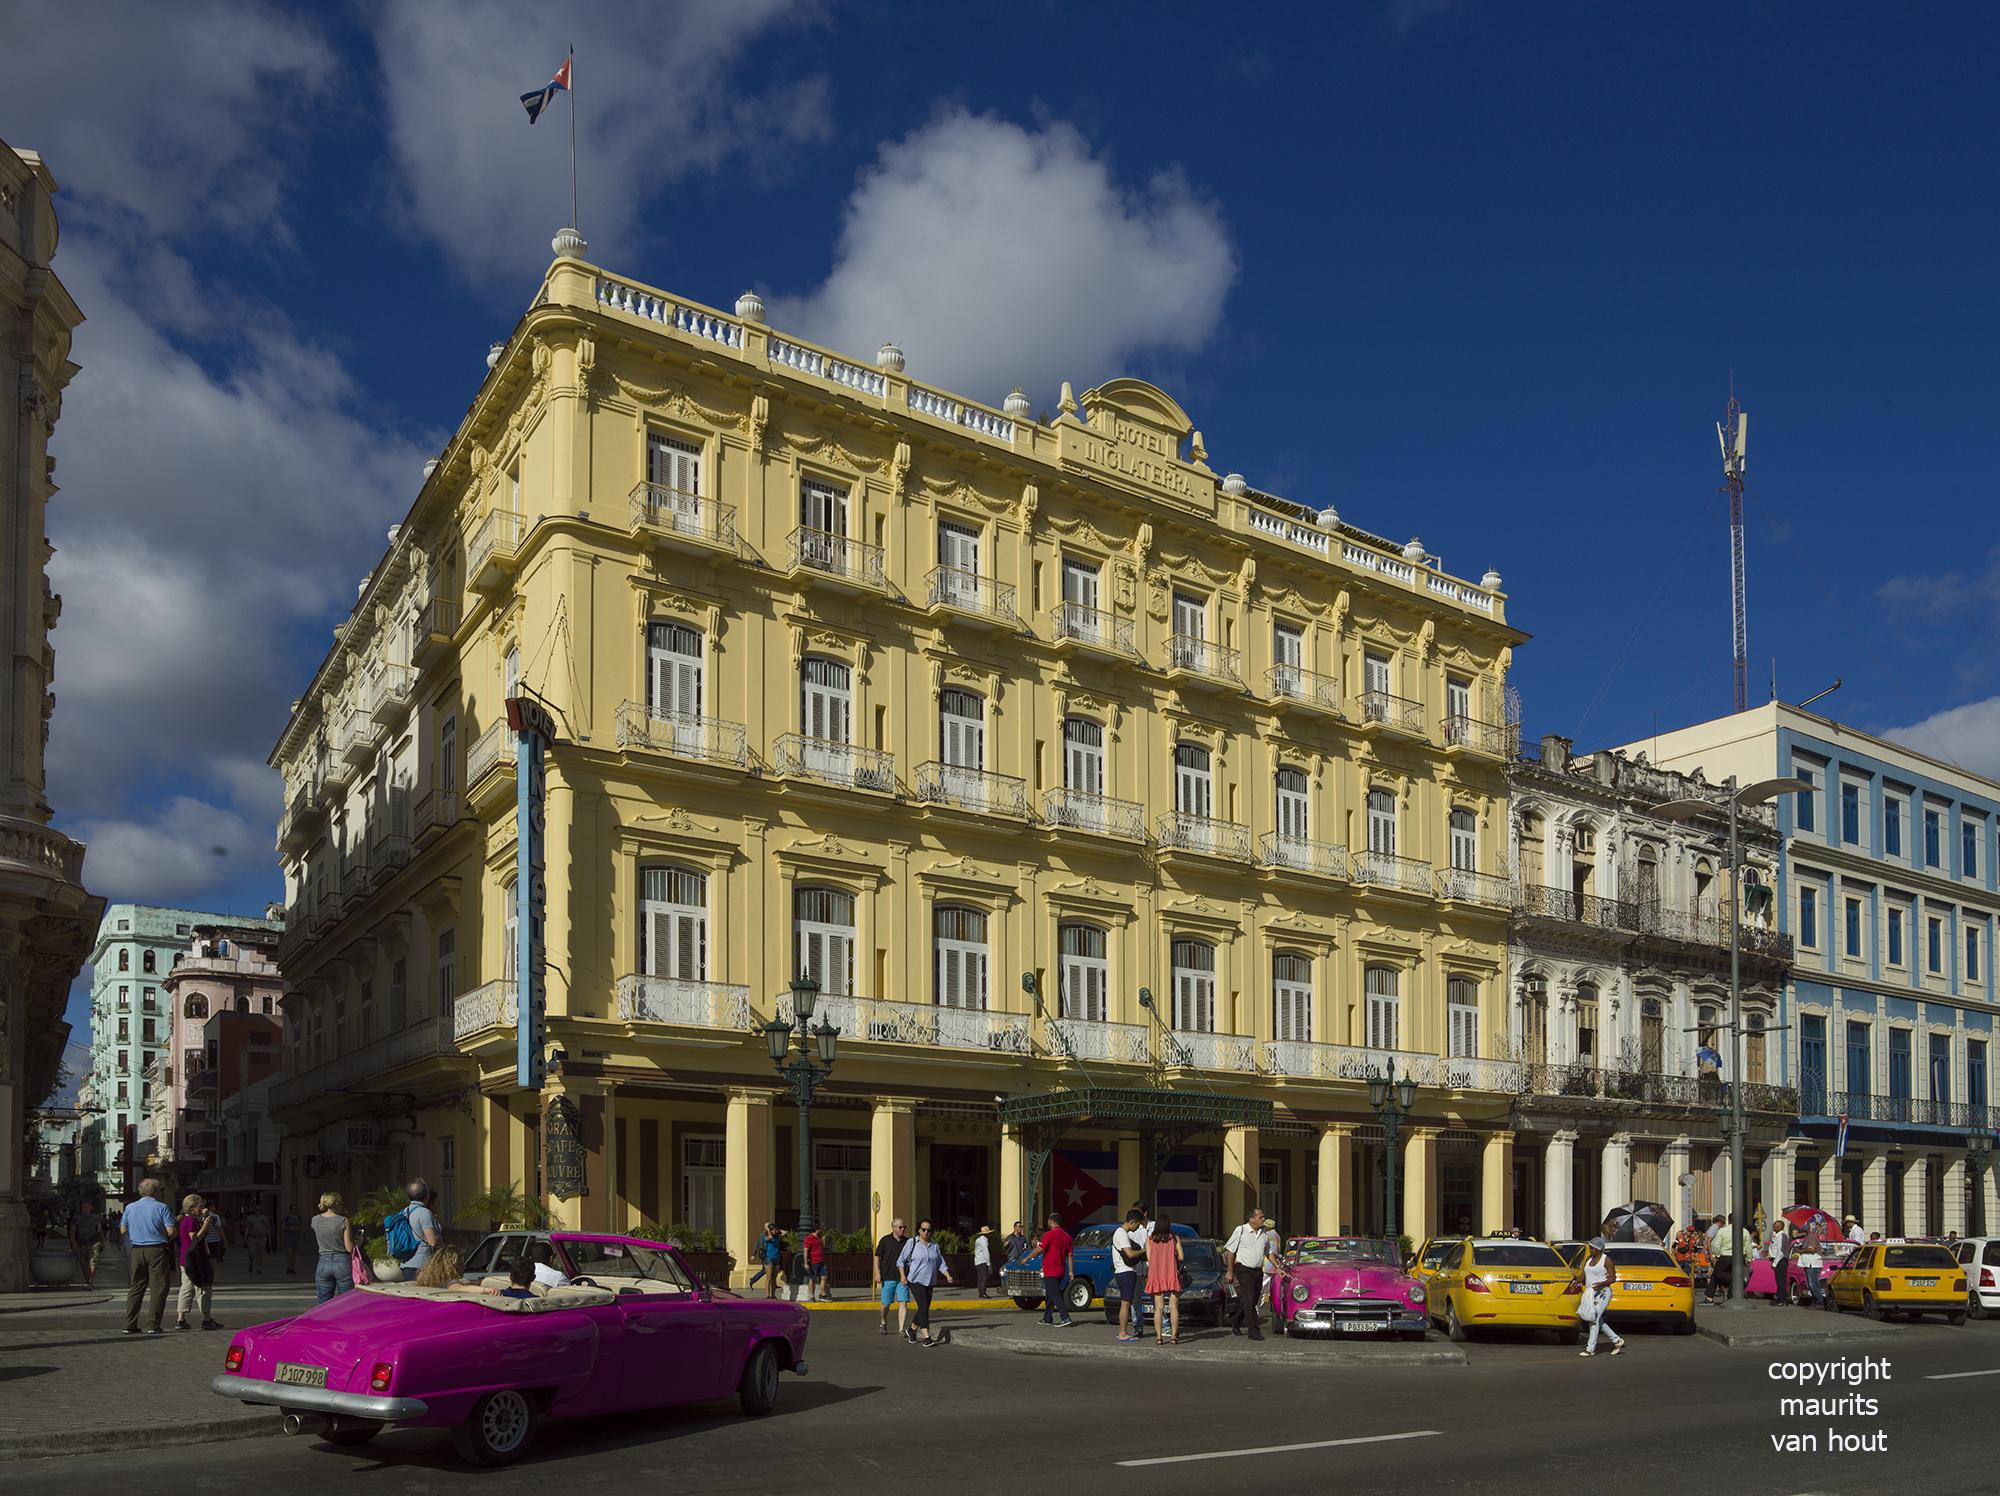 Cuba, Havana by dutch photographer maurits van hout